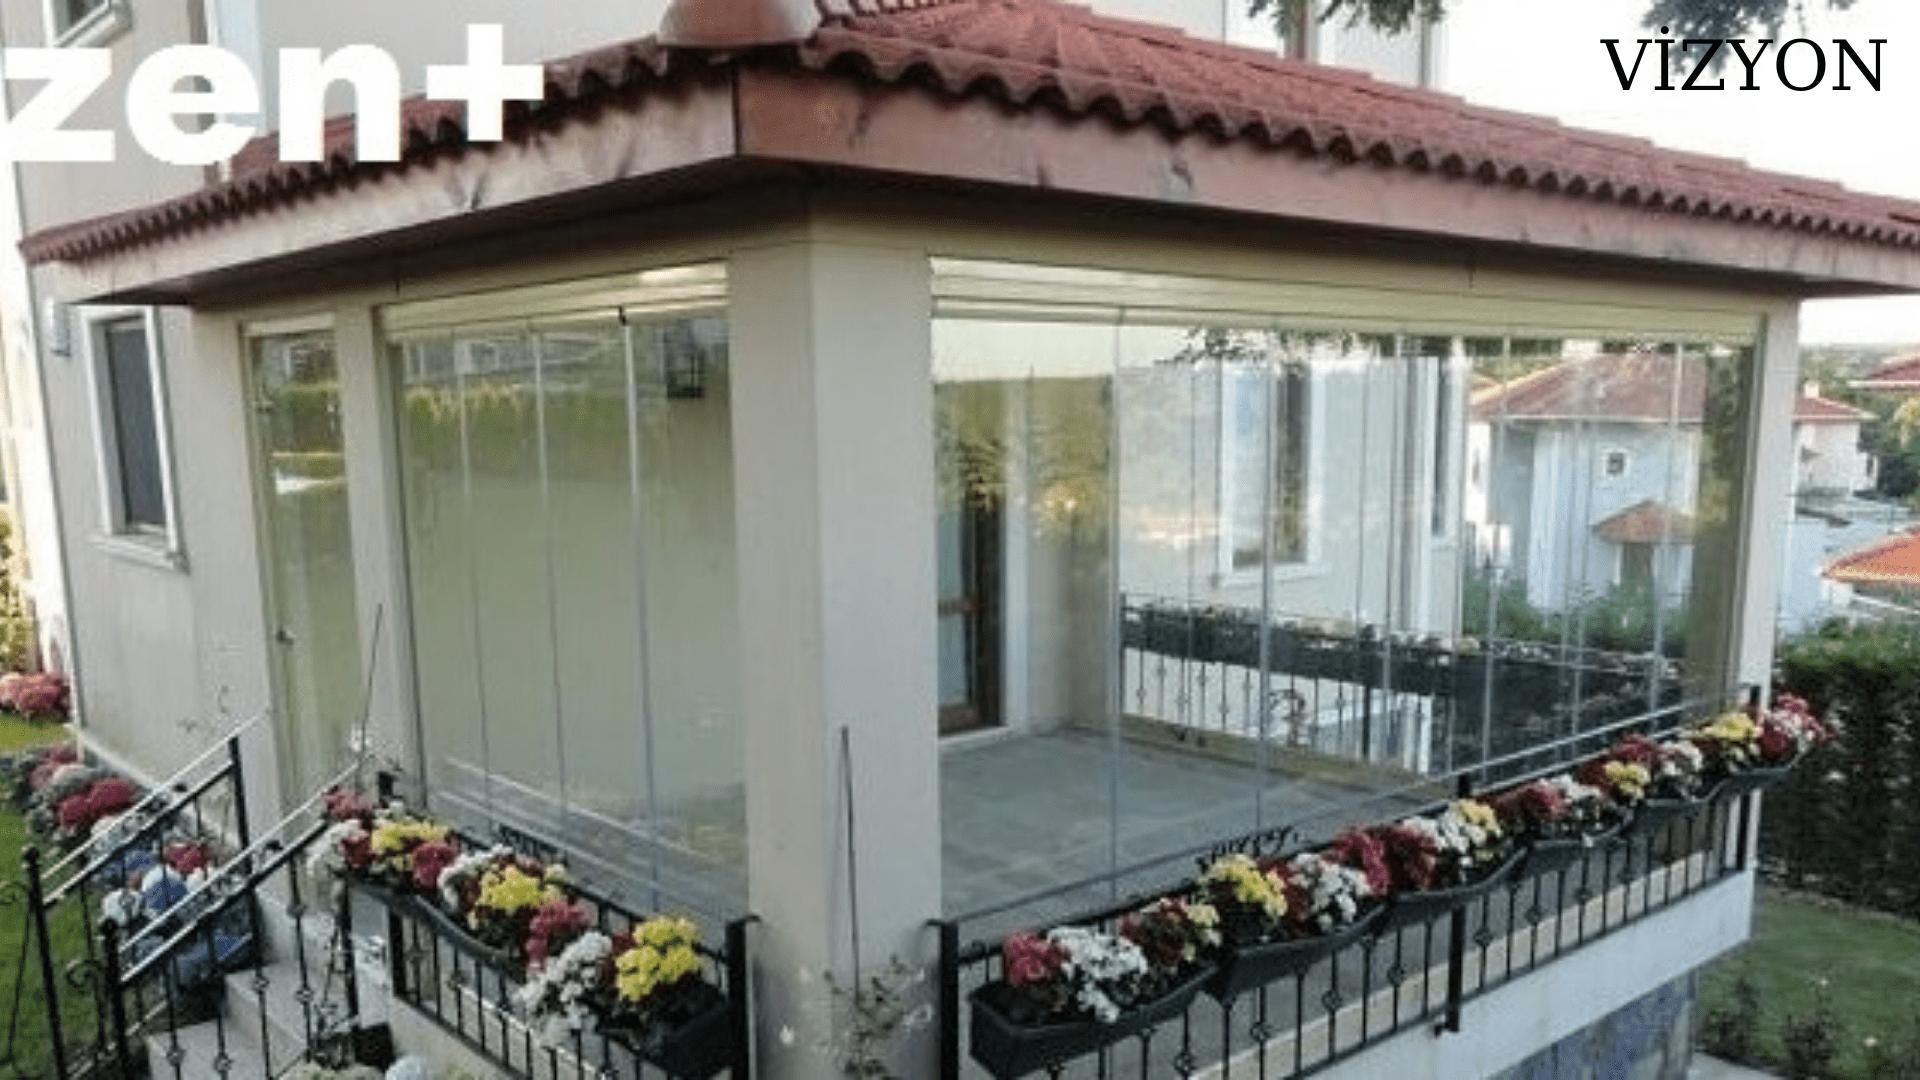 Vizyon cam balkon sistemleri